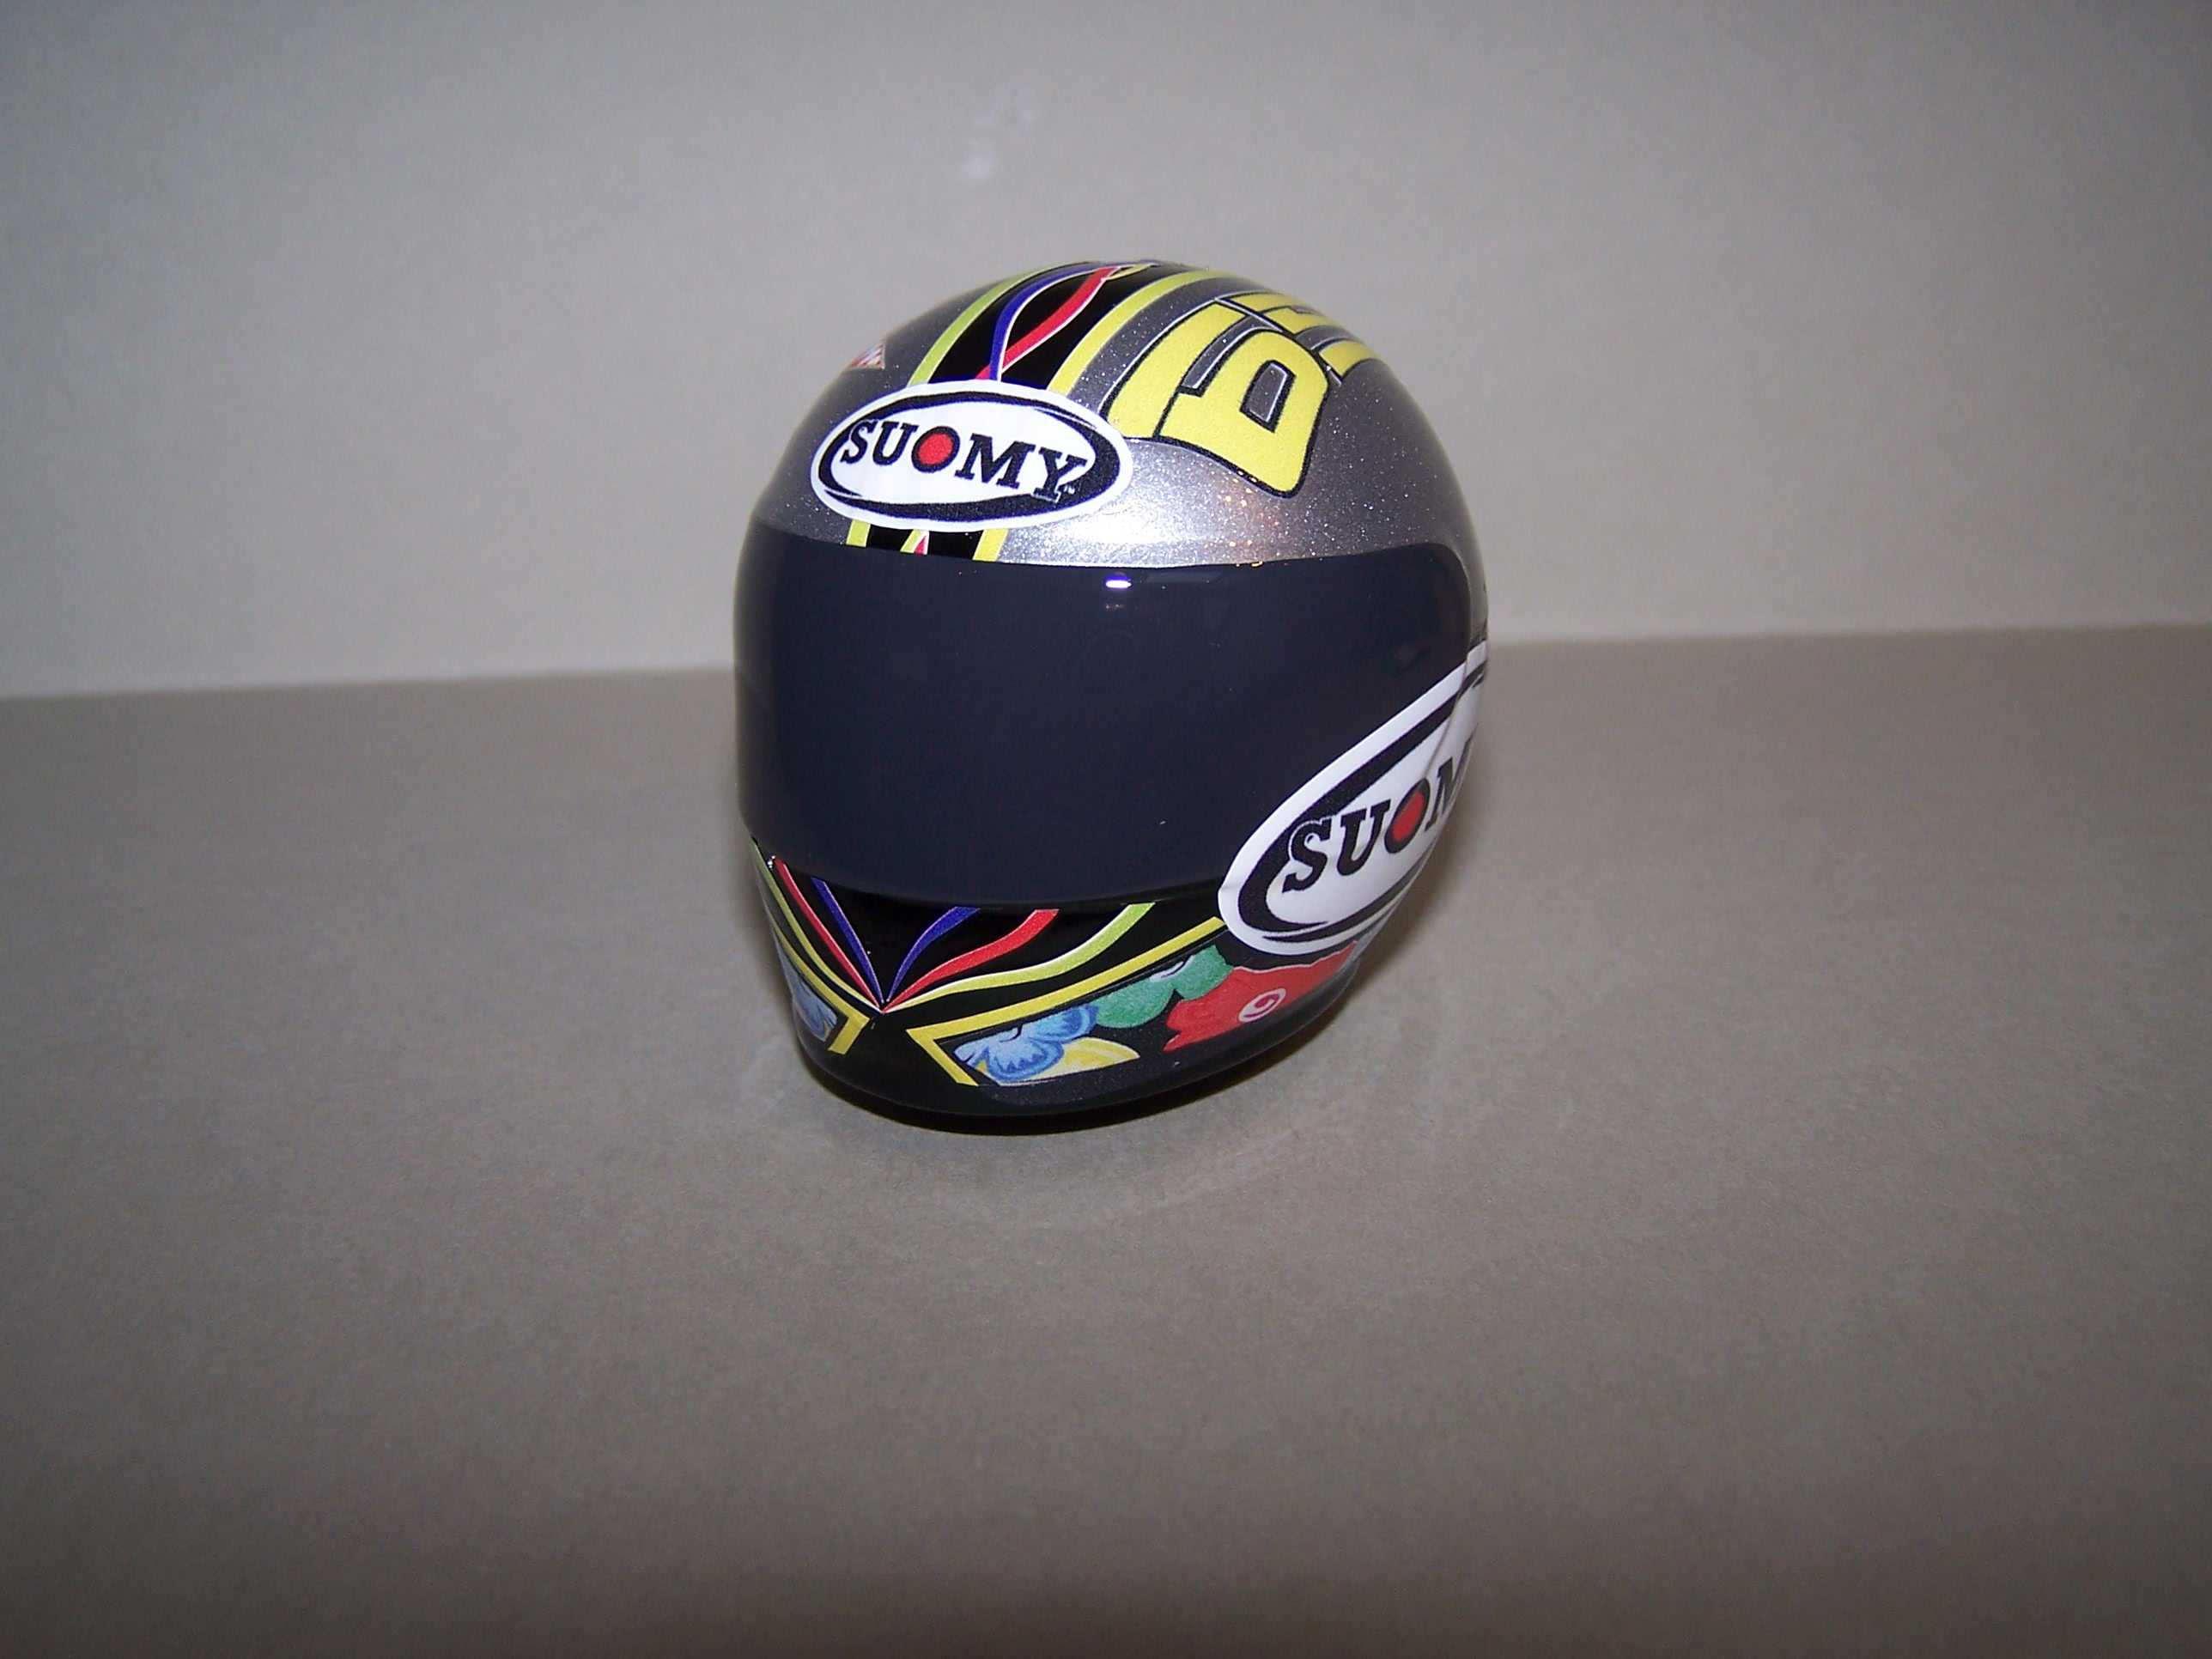 [Helm-Capirossi-Pramac-Ducati-3.jpg]